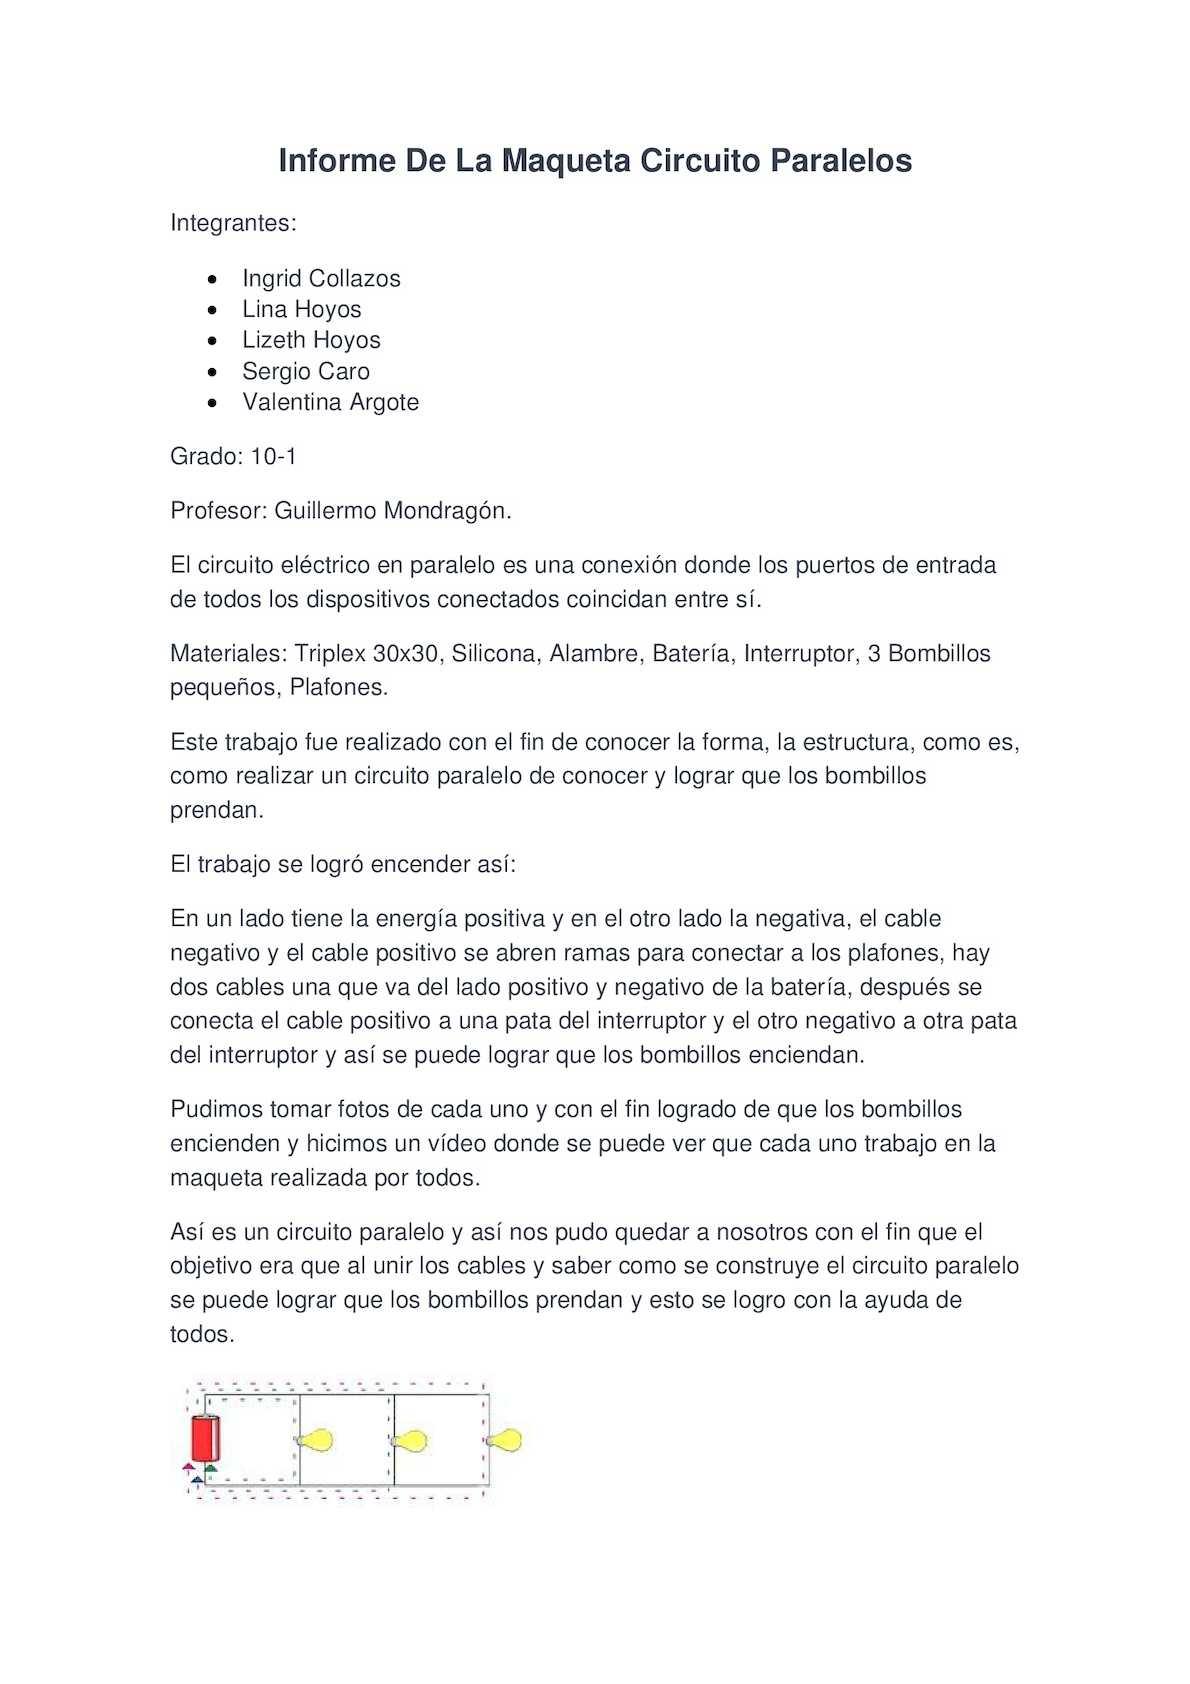 Circuito Paralelo : Calaméo informe de la maqueta circuito paralelos